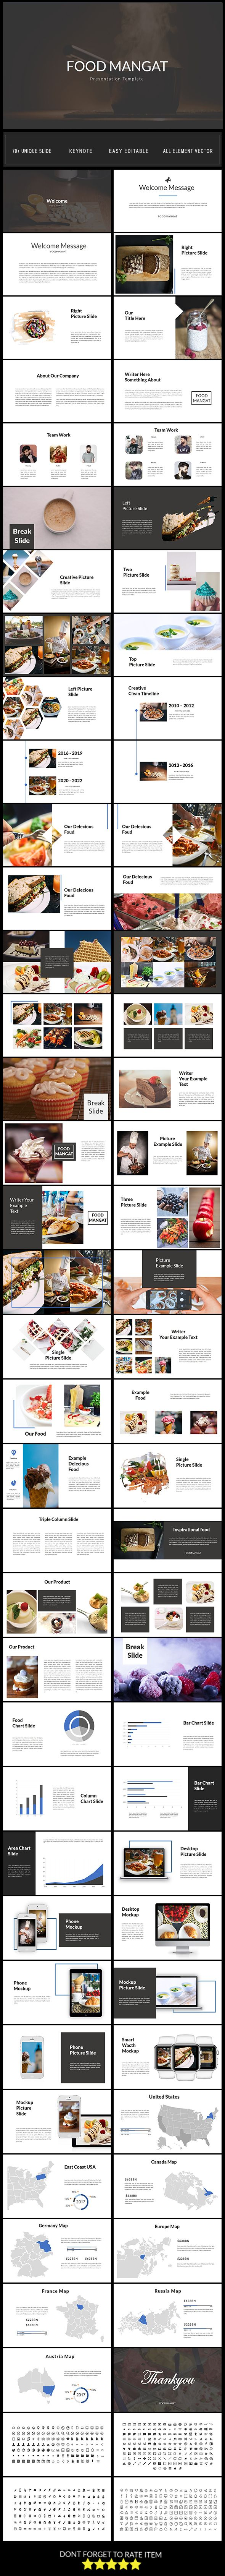 Food Mangat Keynote Presentation Template